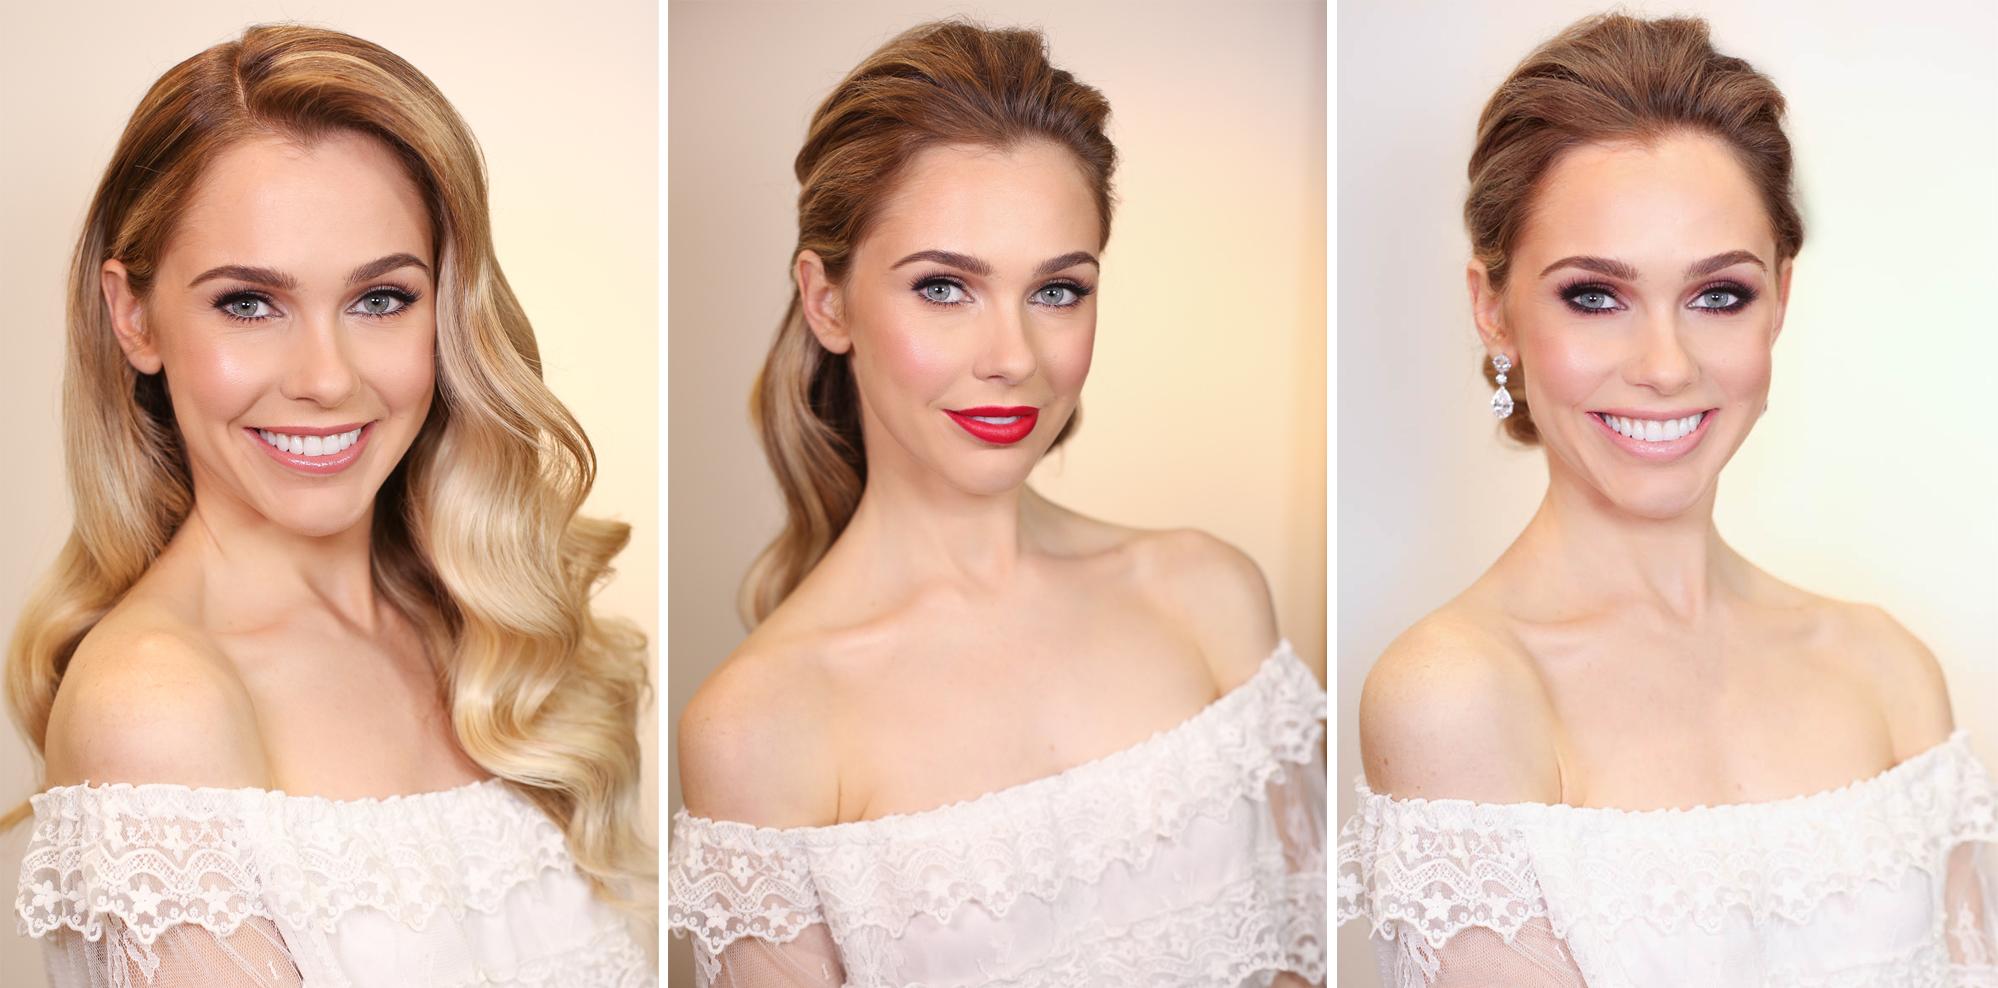 Bridal Perfection Makeup Masterclass - Best Makeup Academy London